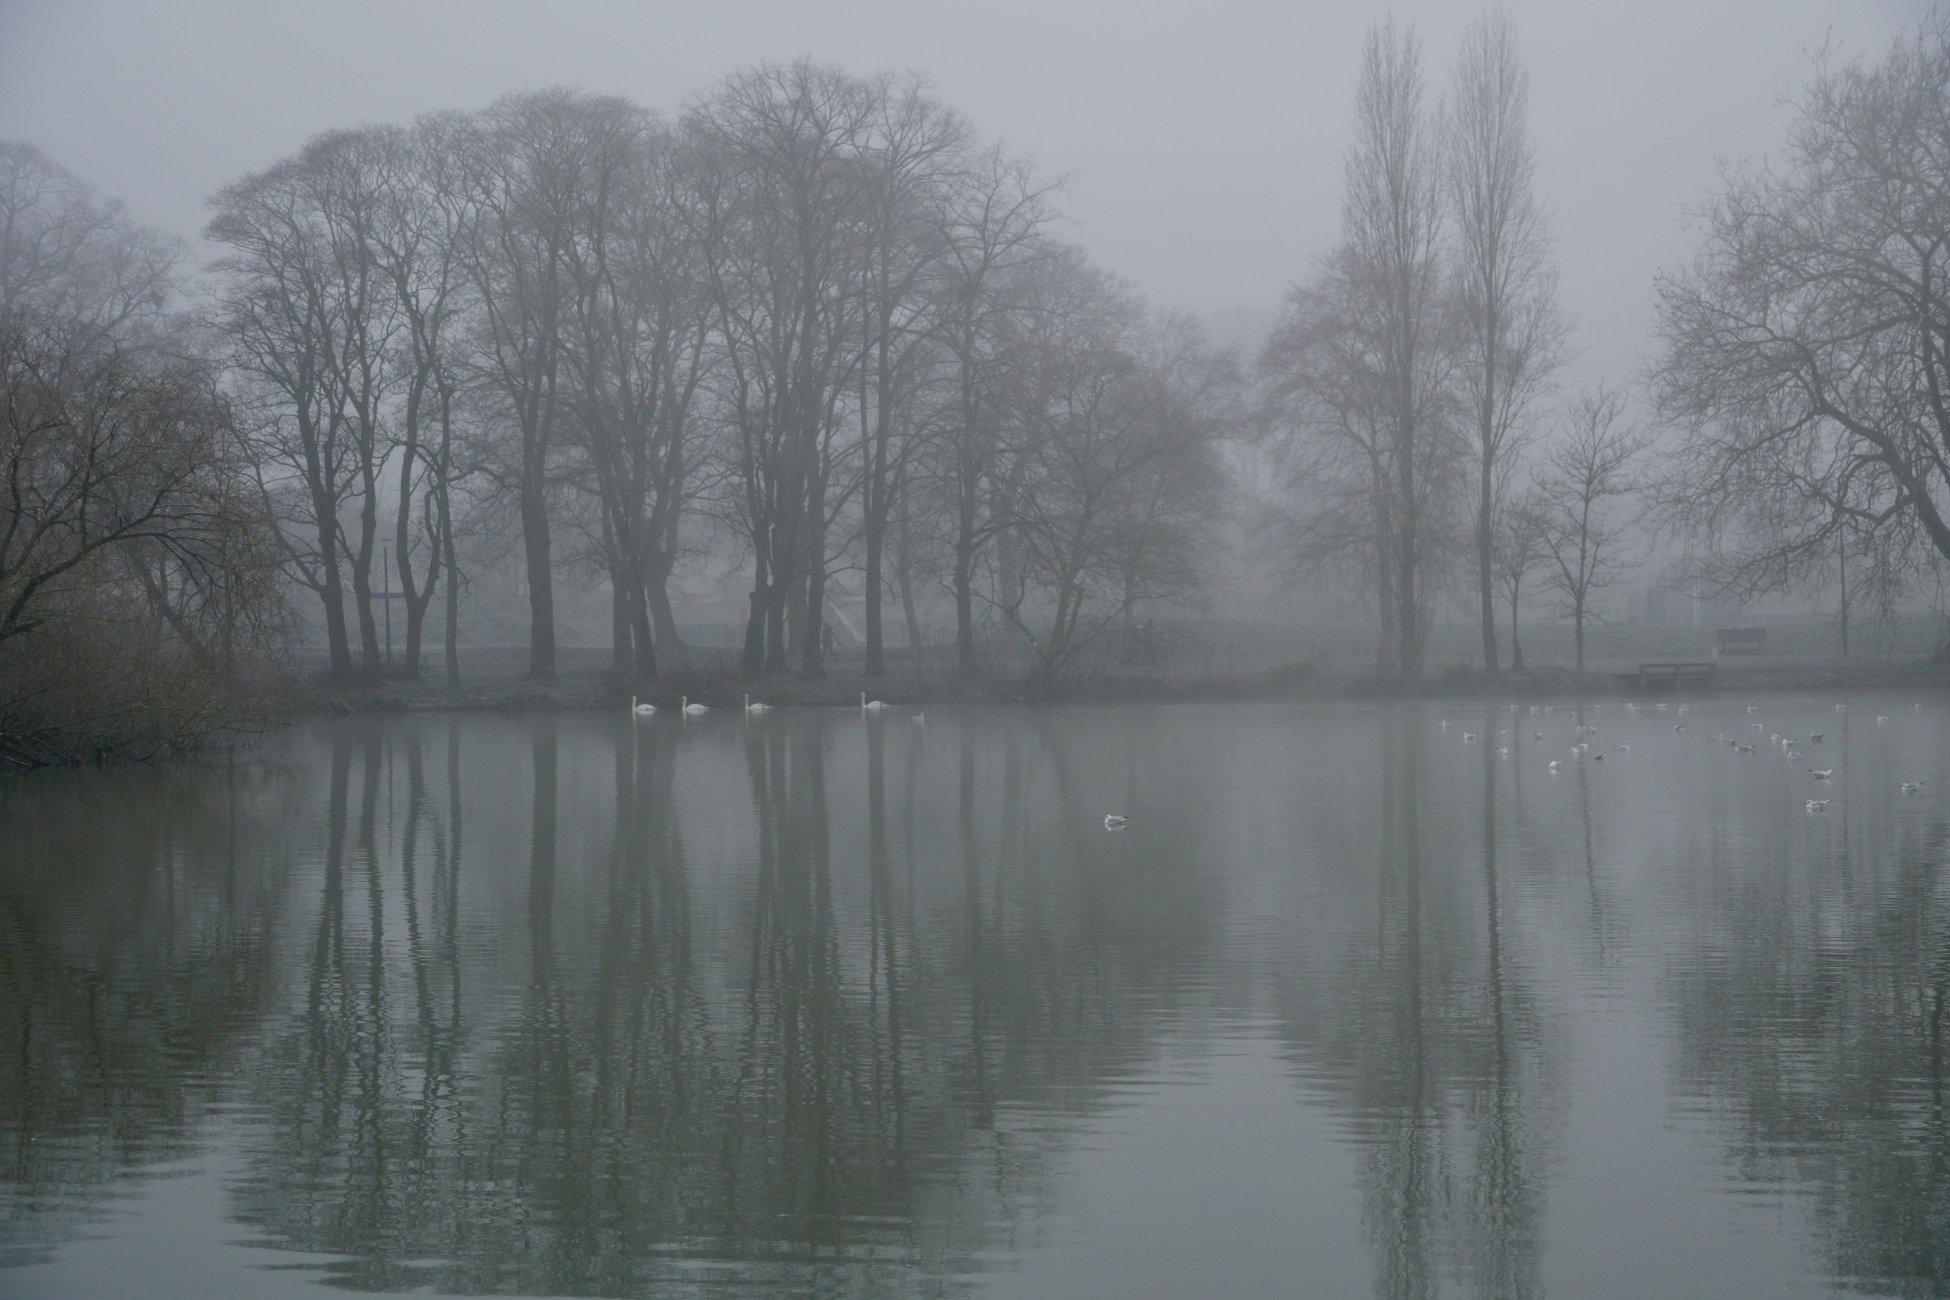 Foggy-Misty morning.